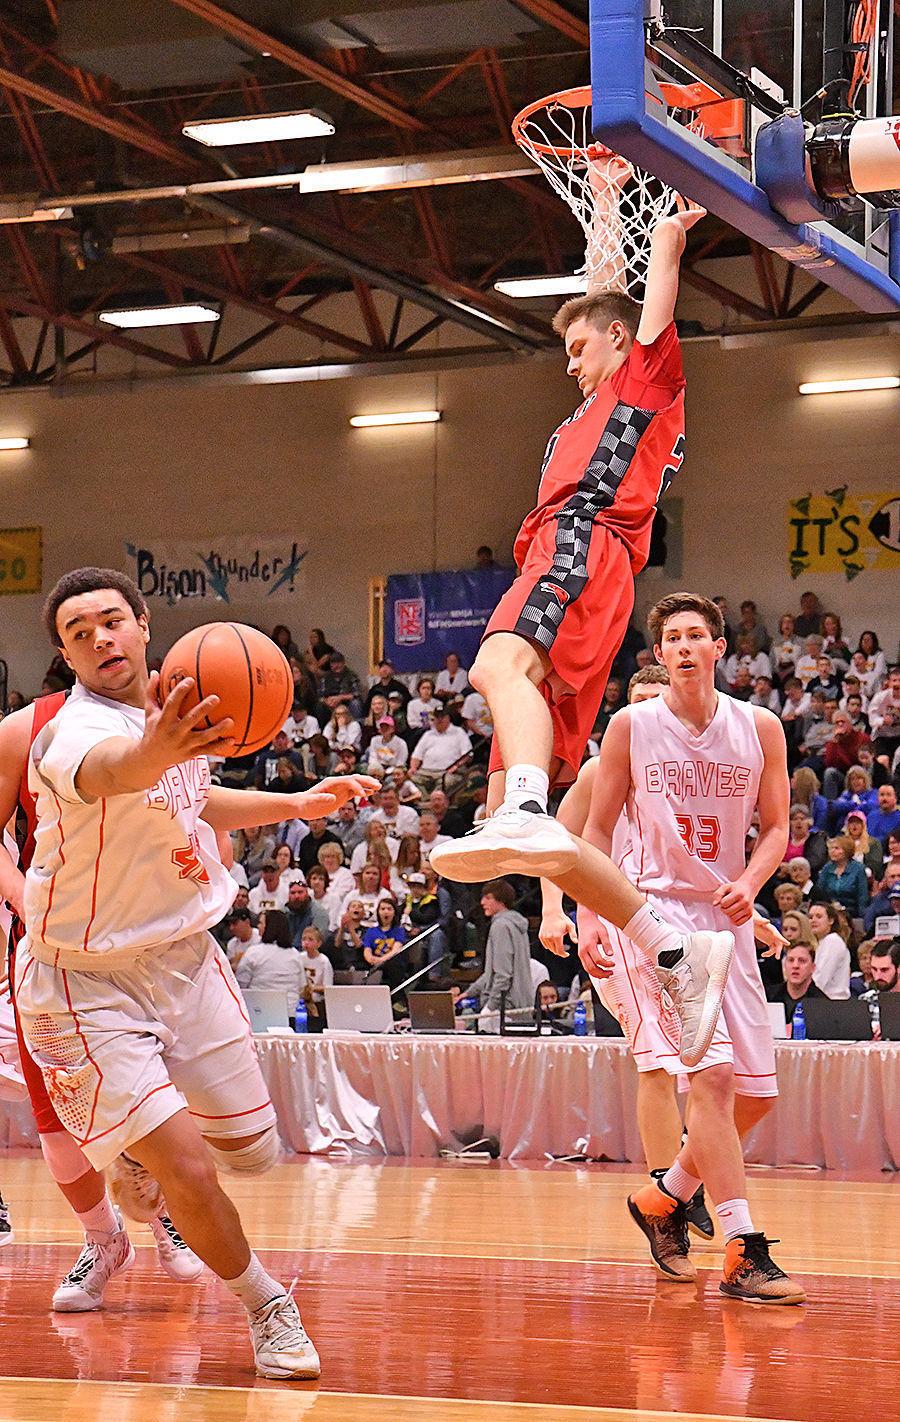 Mack Anderson dunk